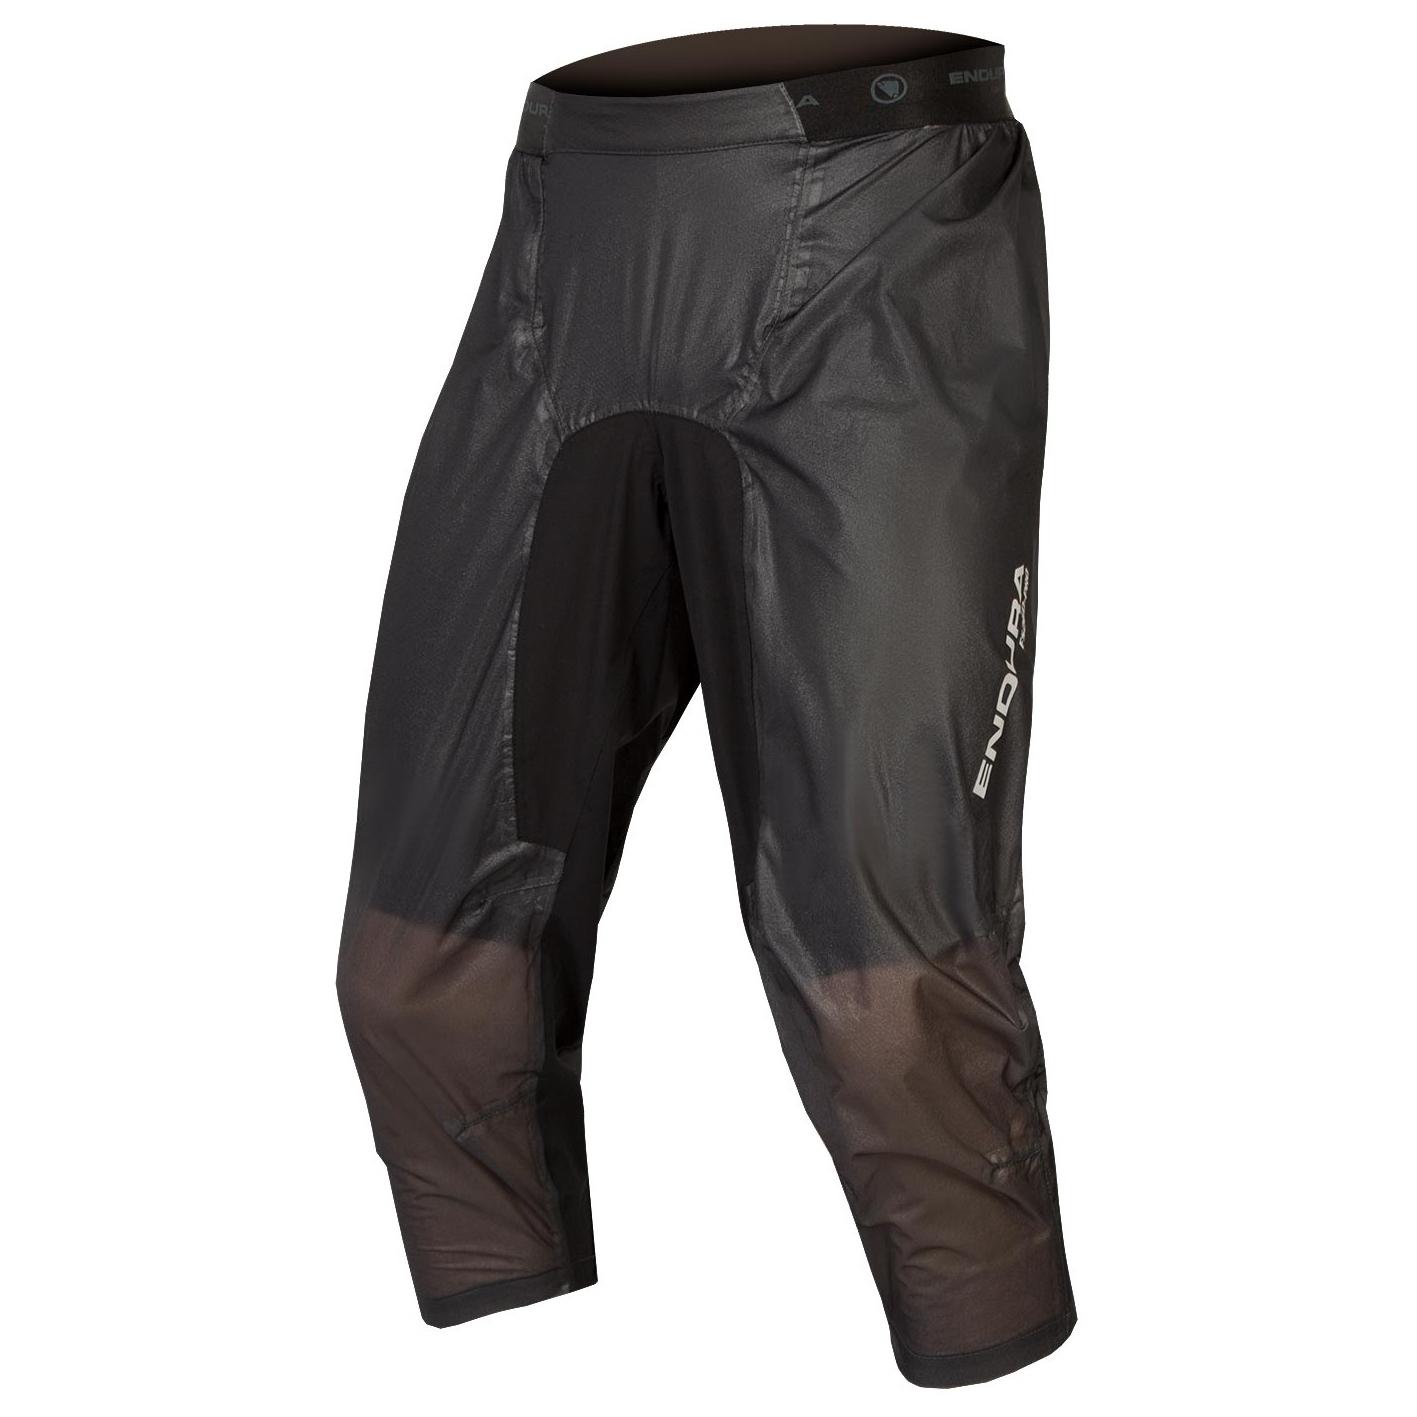 Piumino da donna, piumino da uomo : Endura Pantaloncini